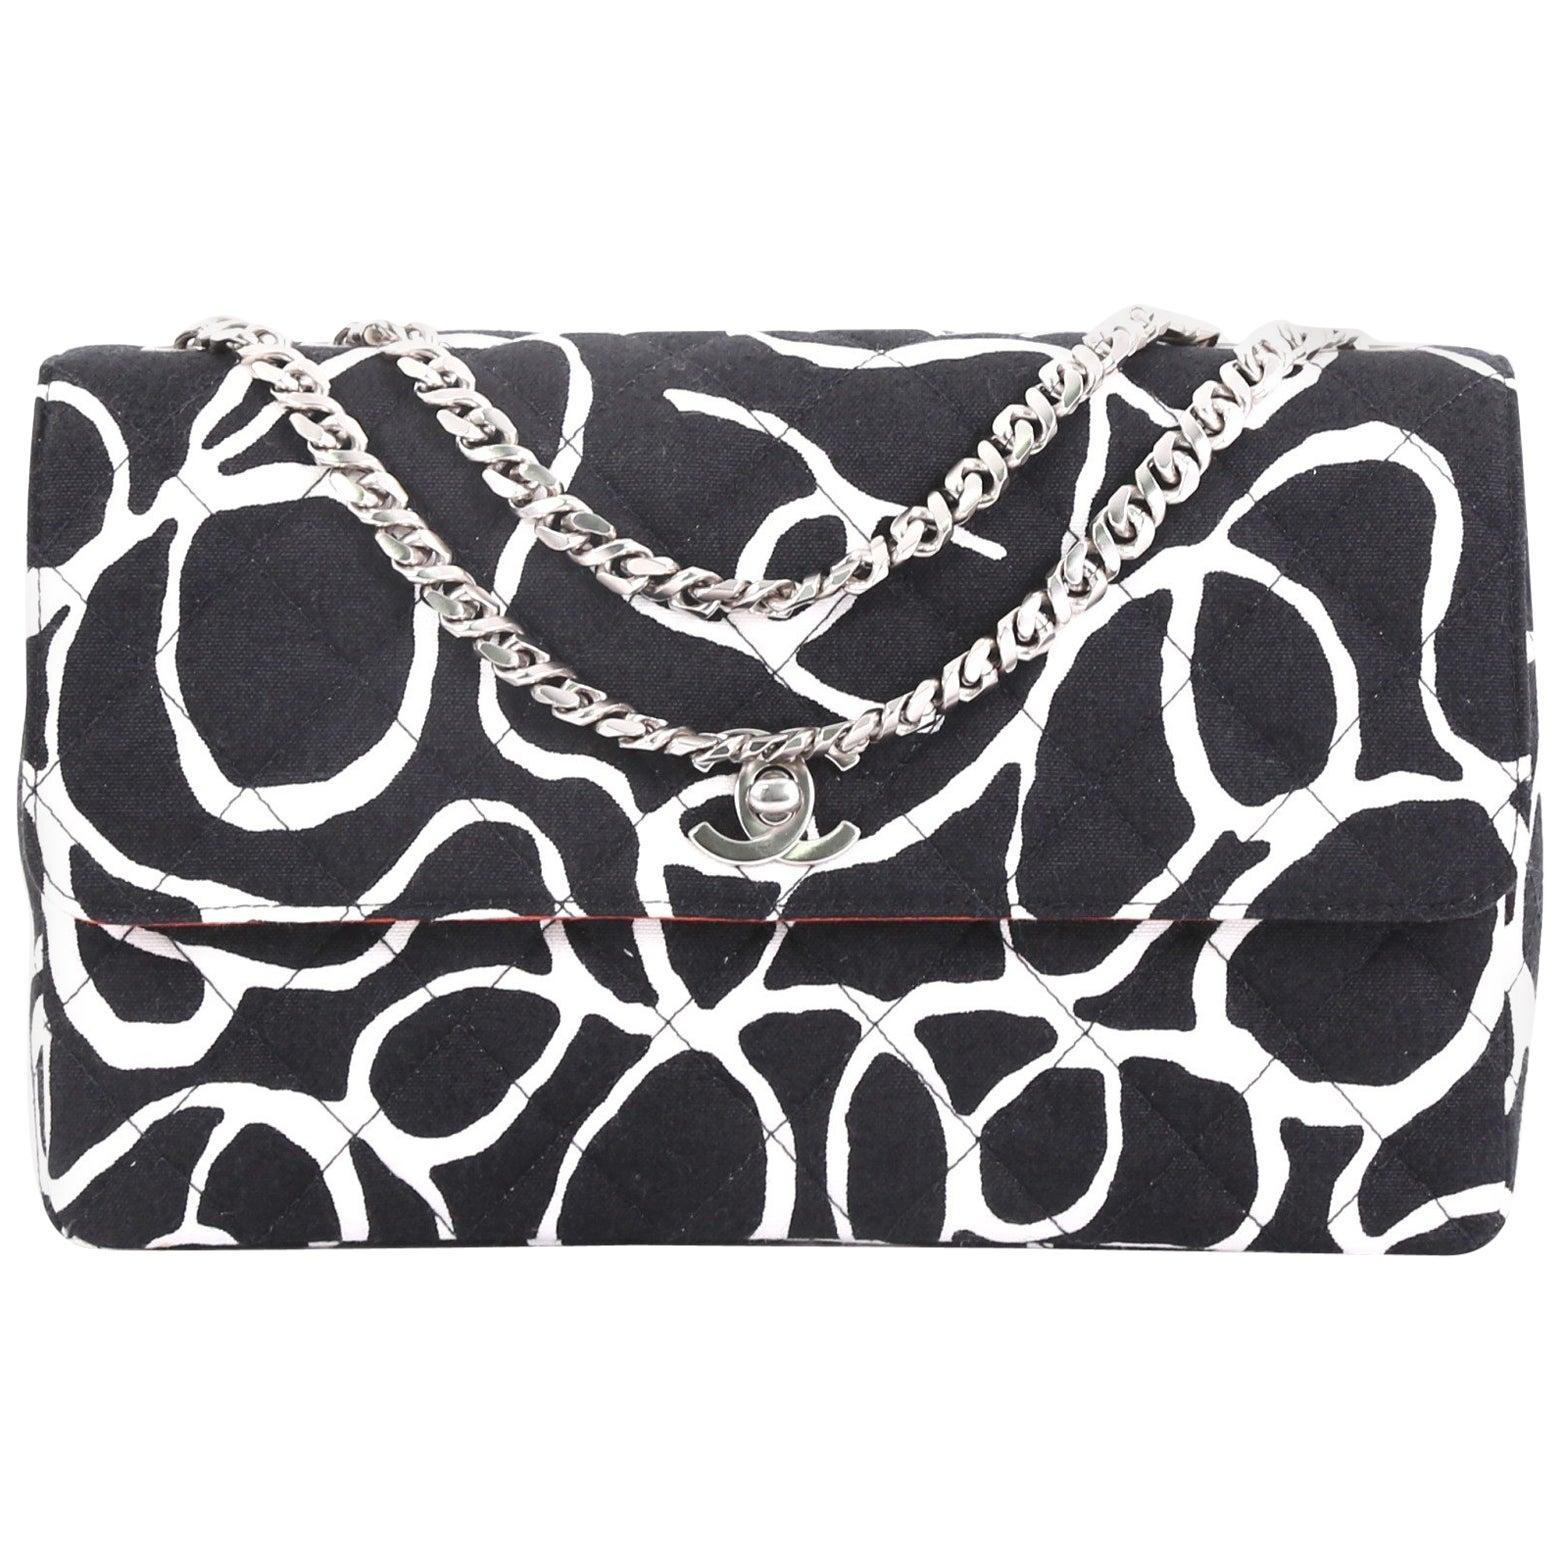 28bd4c6b4b1 Chanel Vintage CC Flap Bag Quilted Printed Canvas Medium at 1stdibs